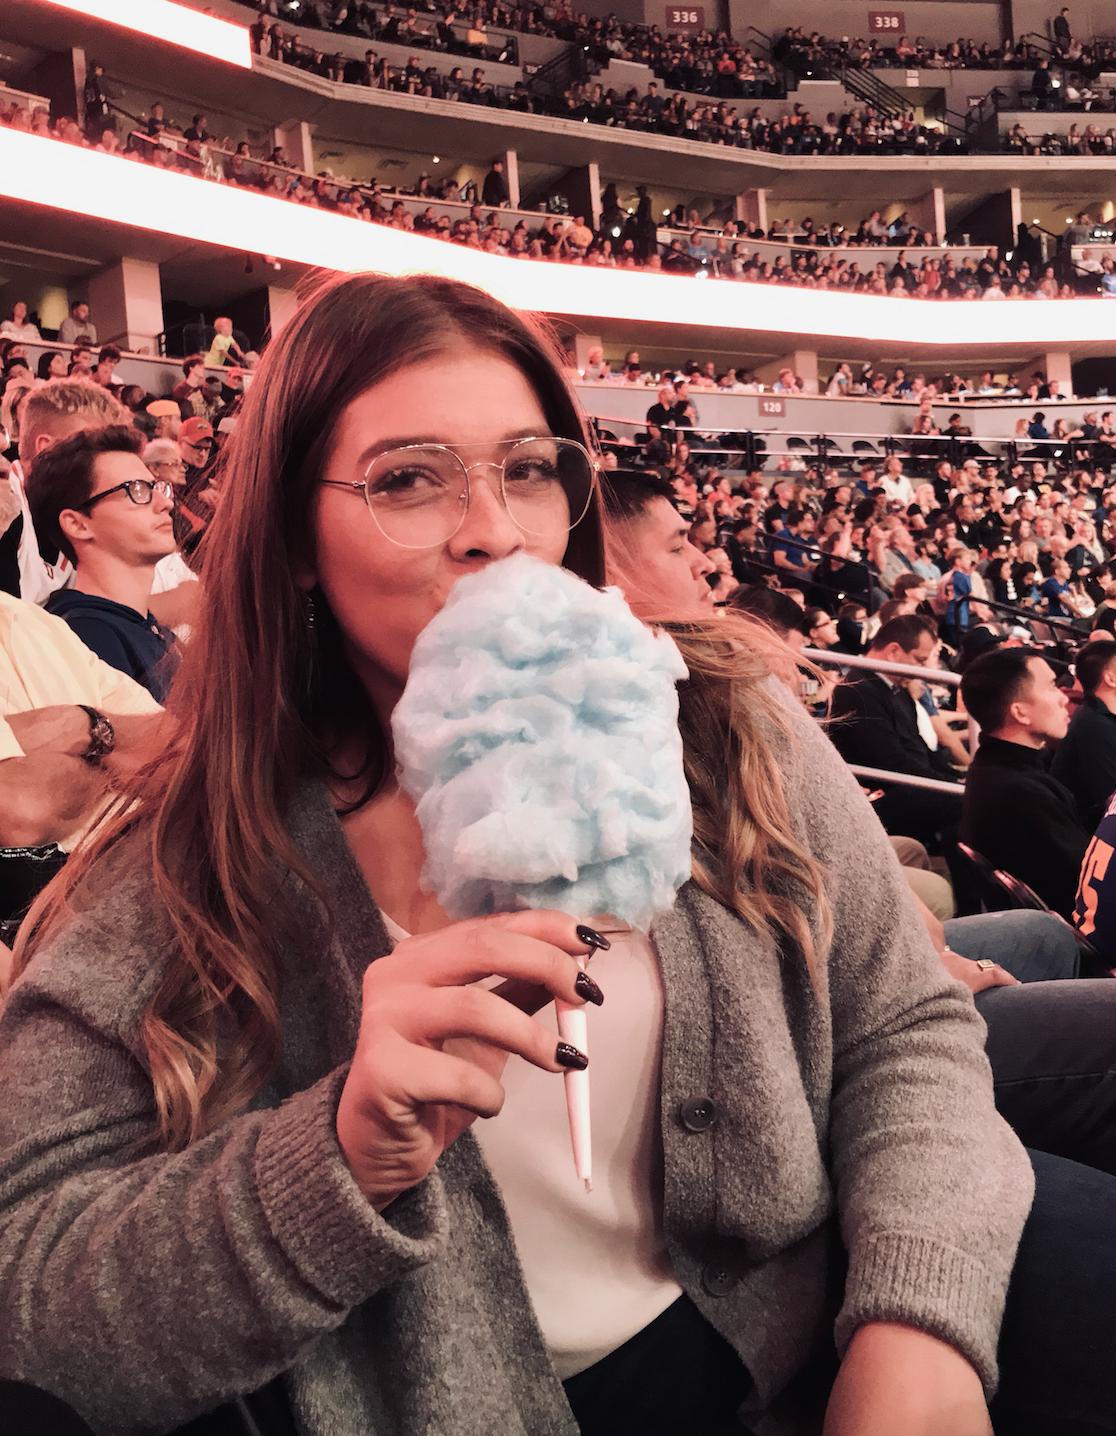 Pepsi Center  |  Warriors vs. Nuggets